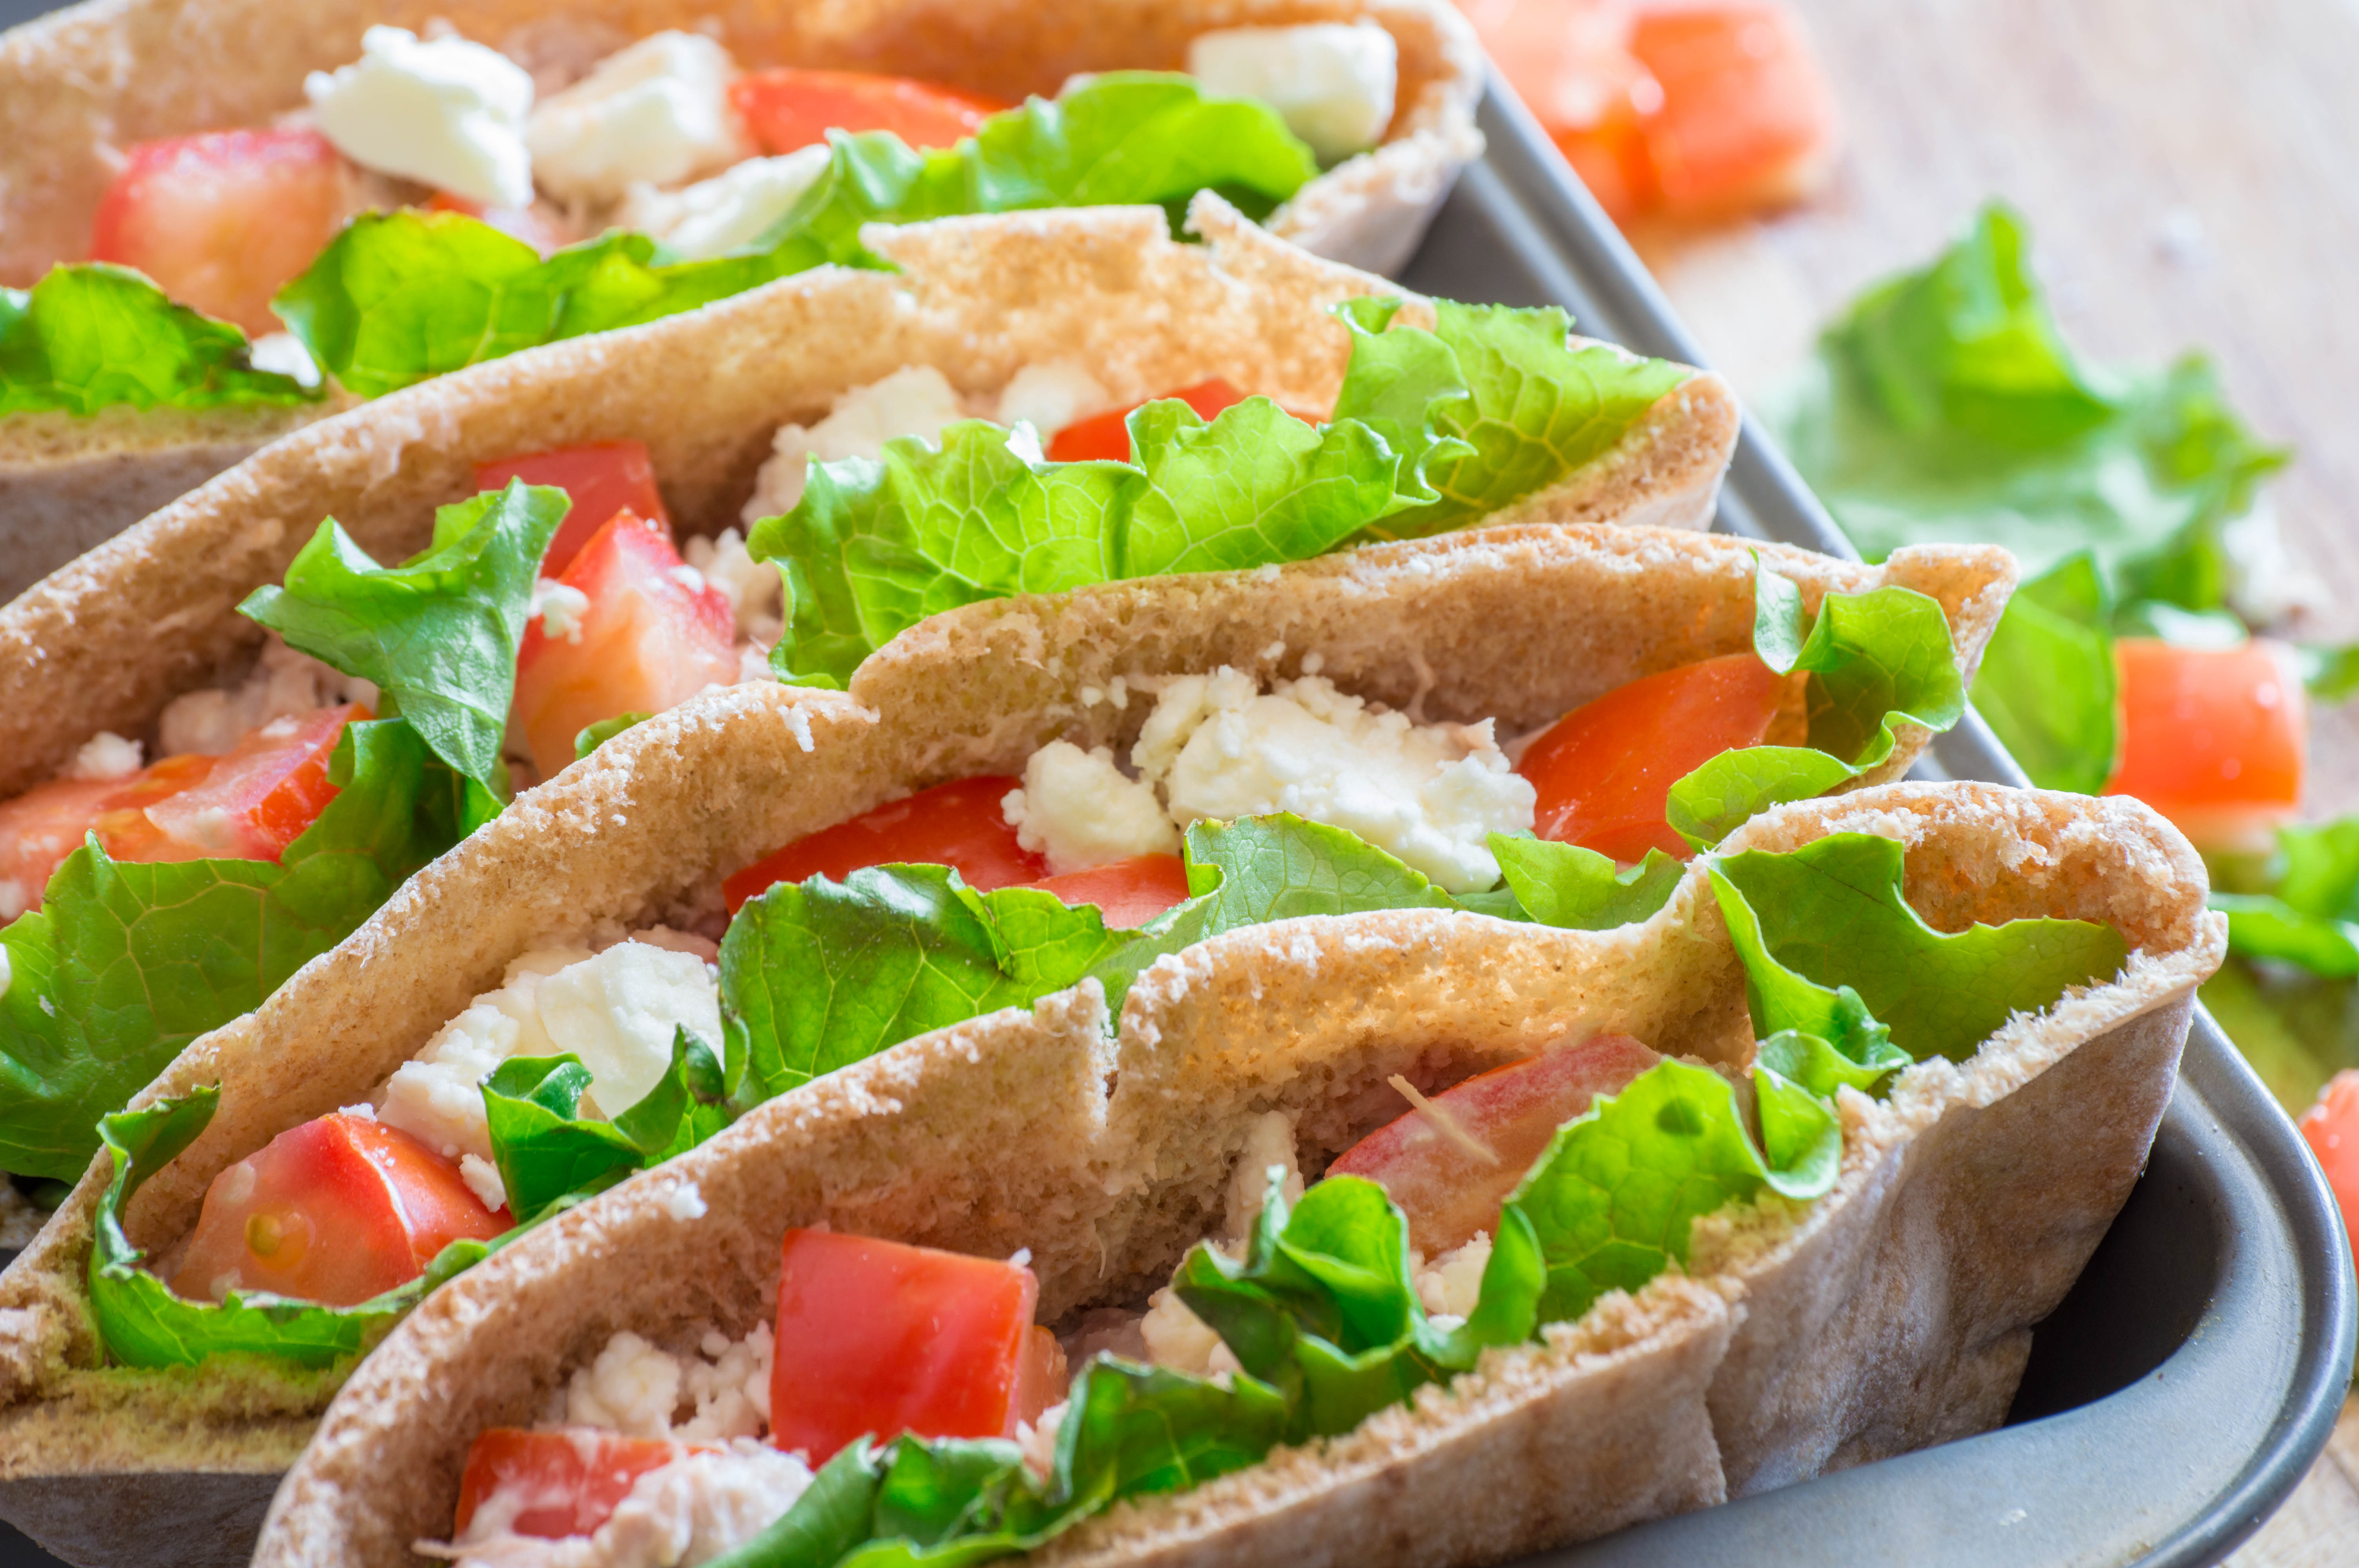 Tomato and Feta Tuna Salad | Homan at Home